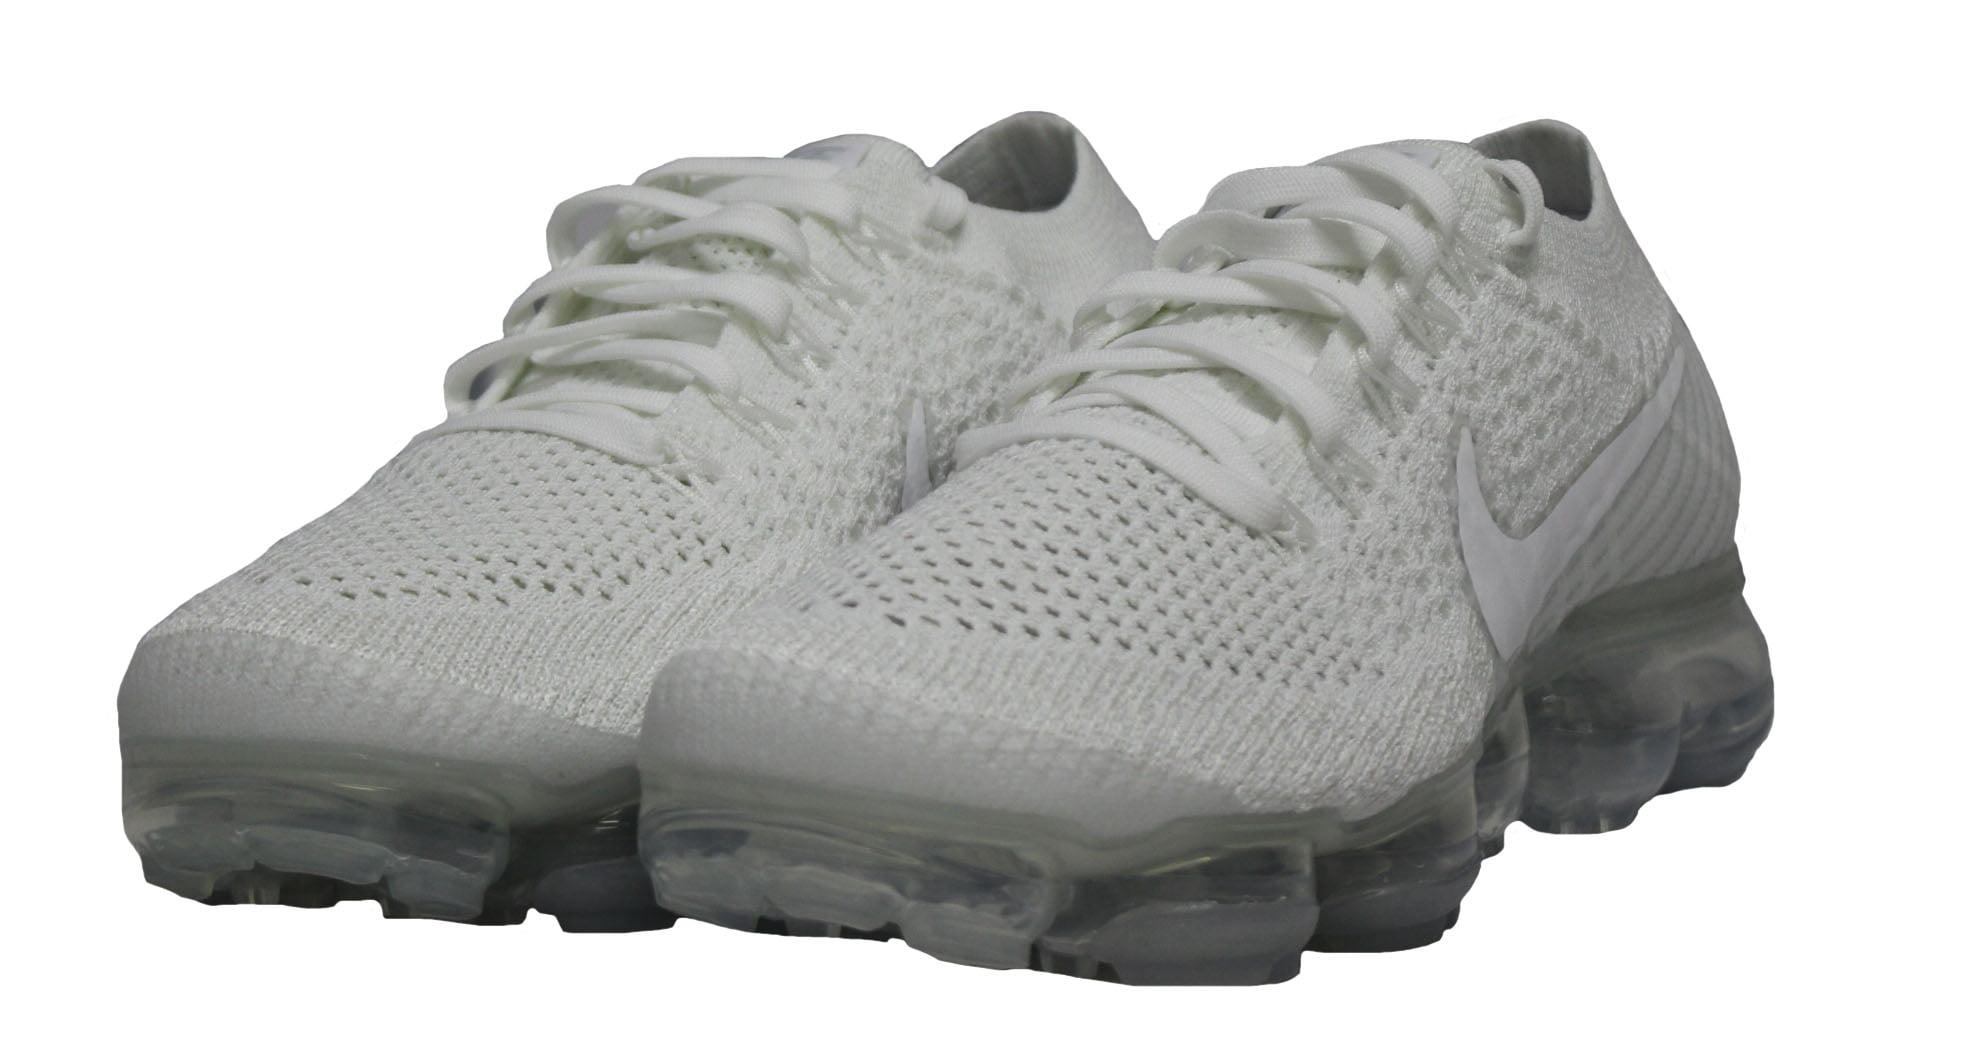 dd02bb71c623c Nike - NIKE WOMENS AIR VAPORMAX FLYKNIT SZ 6.5 WHITE SAIL LIGHT BONE ...